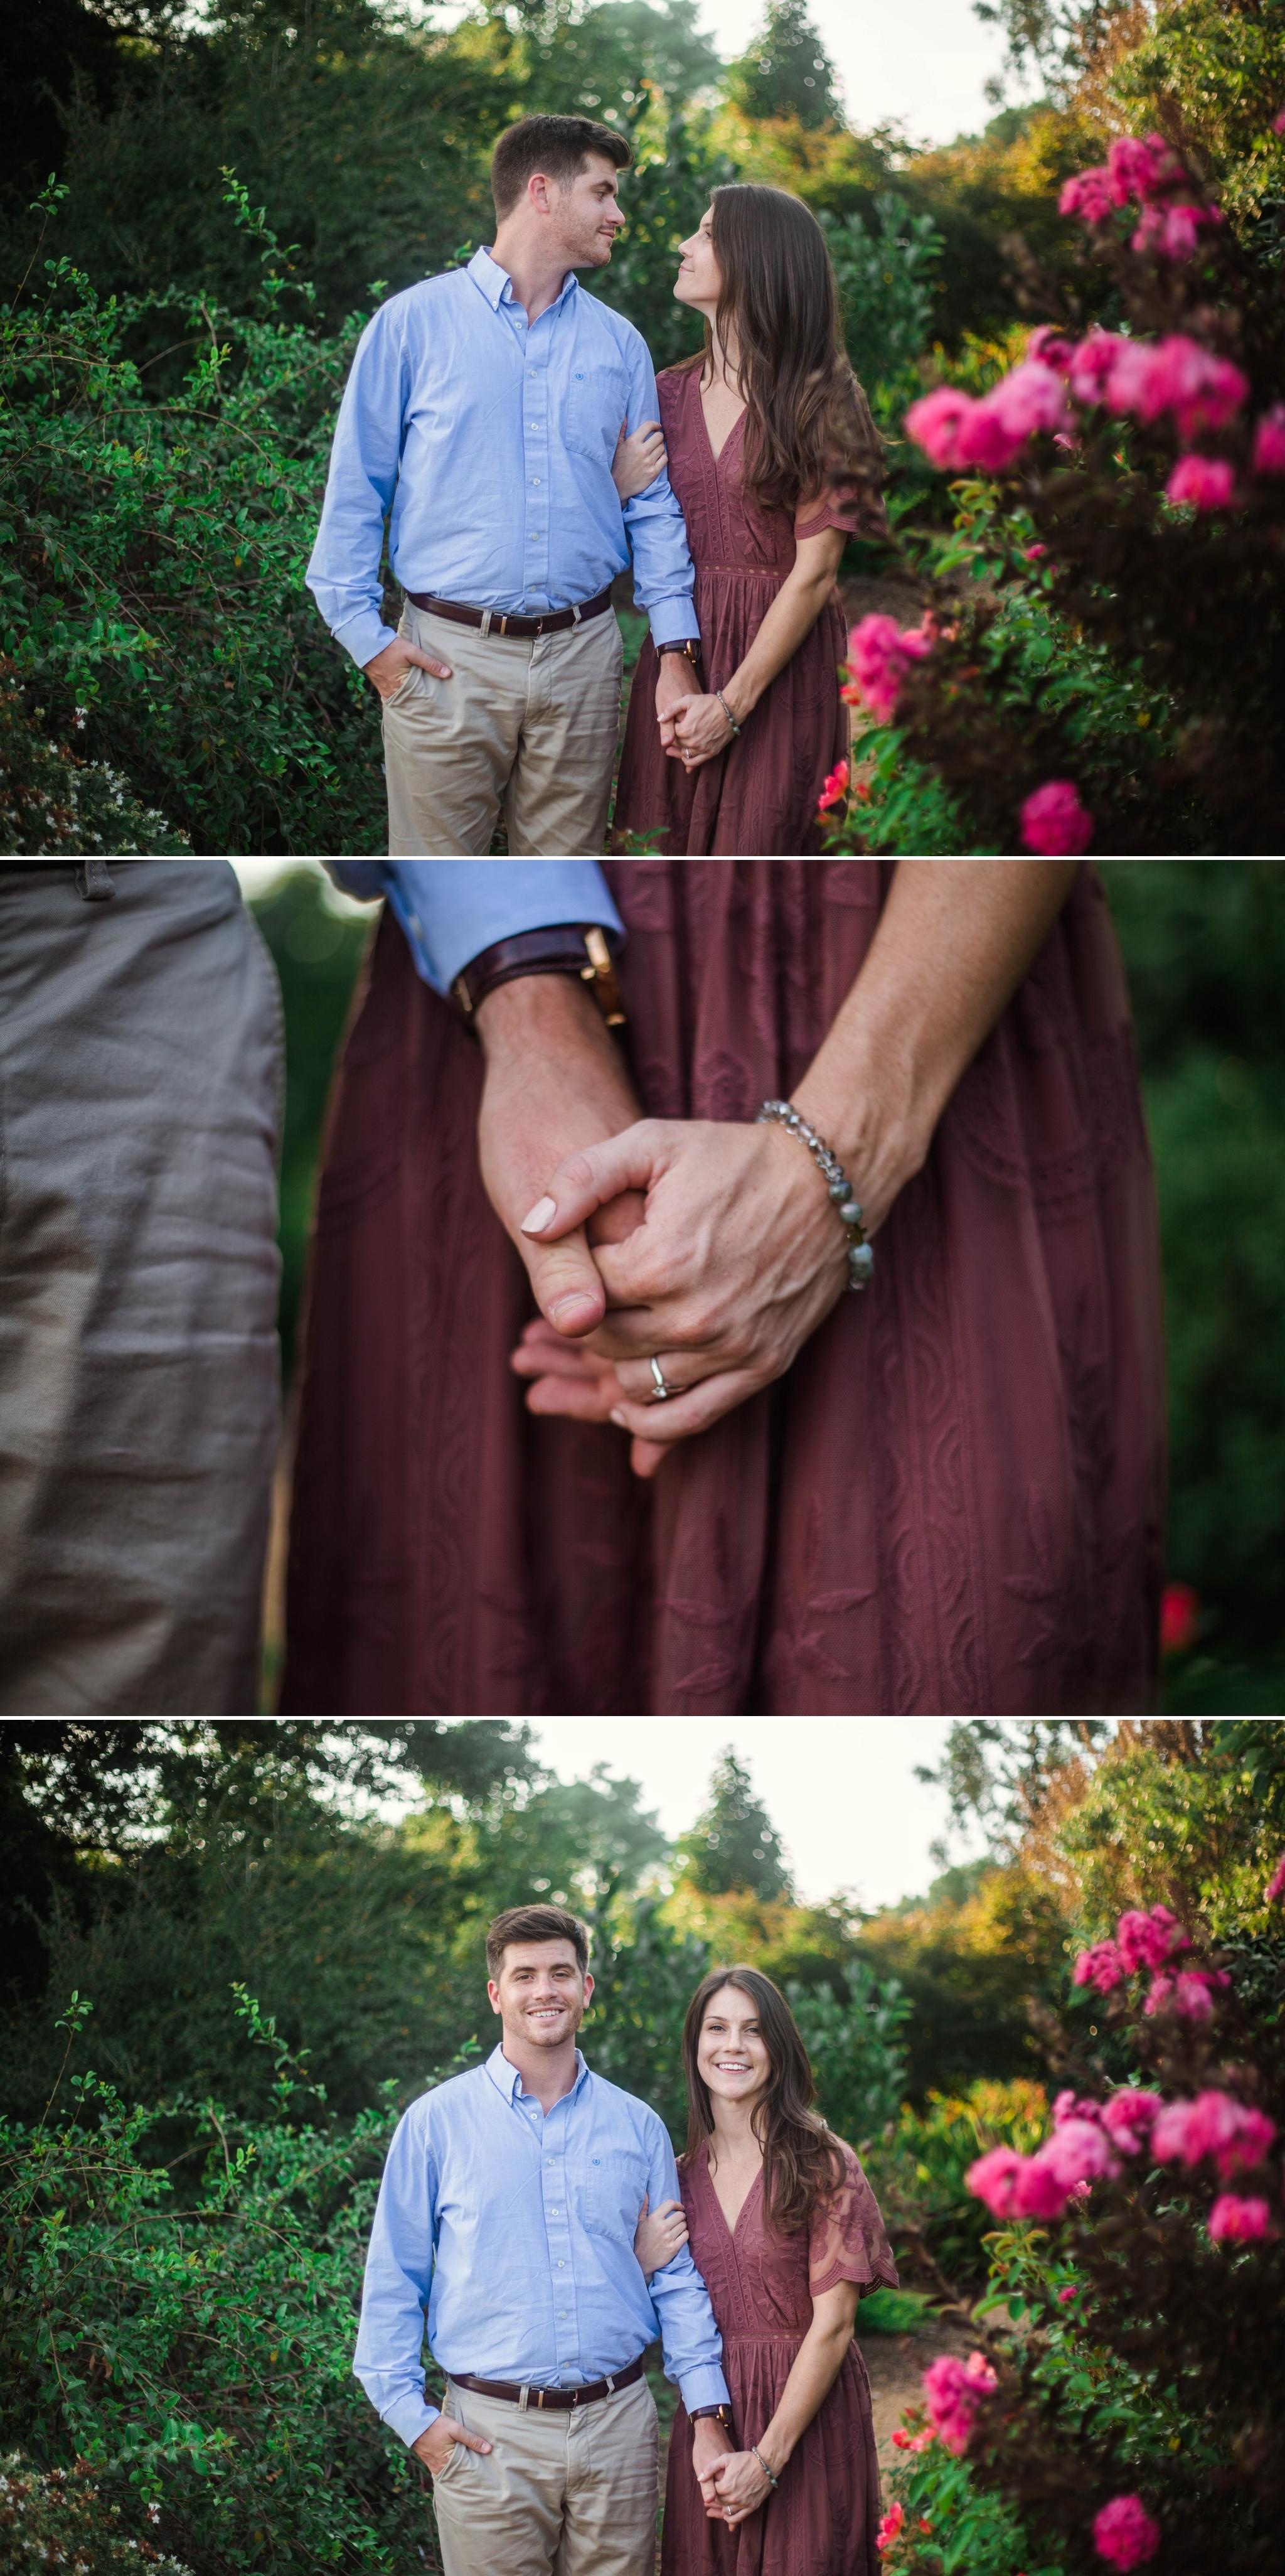 Garden Engagement - Aryn + Tyler -  Photography Session at the JC Raulston Arboretum - Raleigh Wedding Photographer